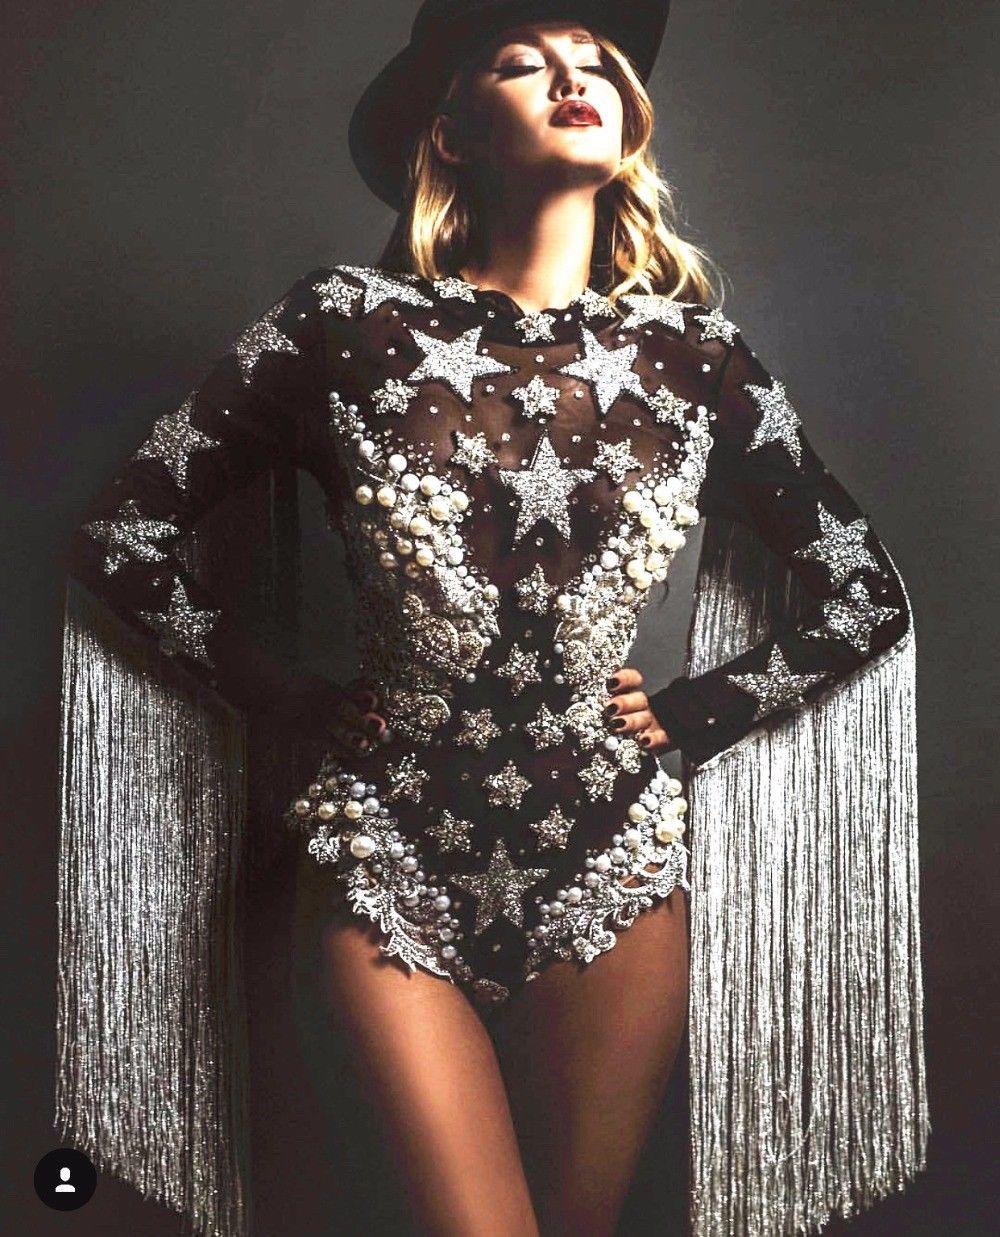 240e11eda1 Details about Tassel Crystals Stars Pearl Bodysuit Women Stage Dance  fringes Leotard Nightclub